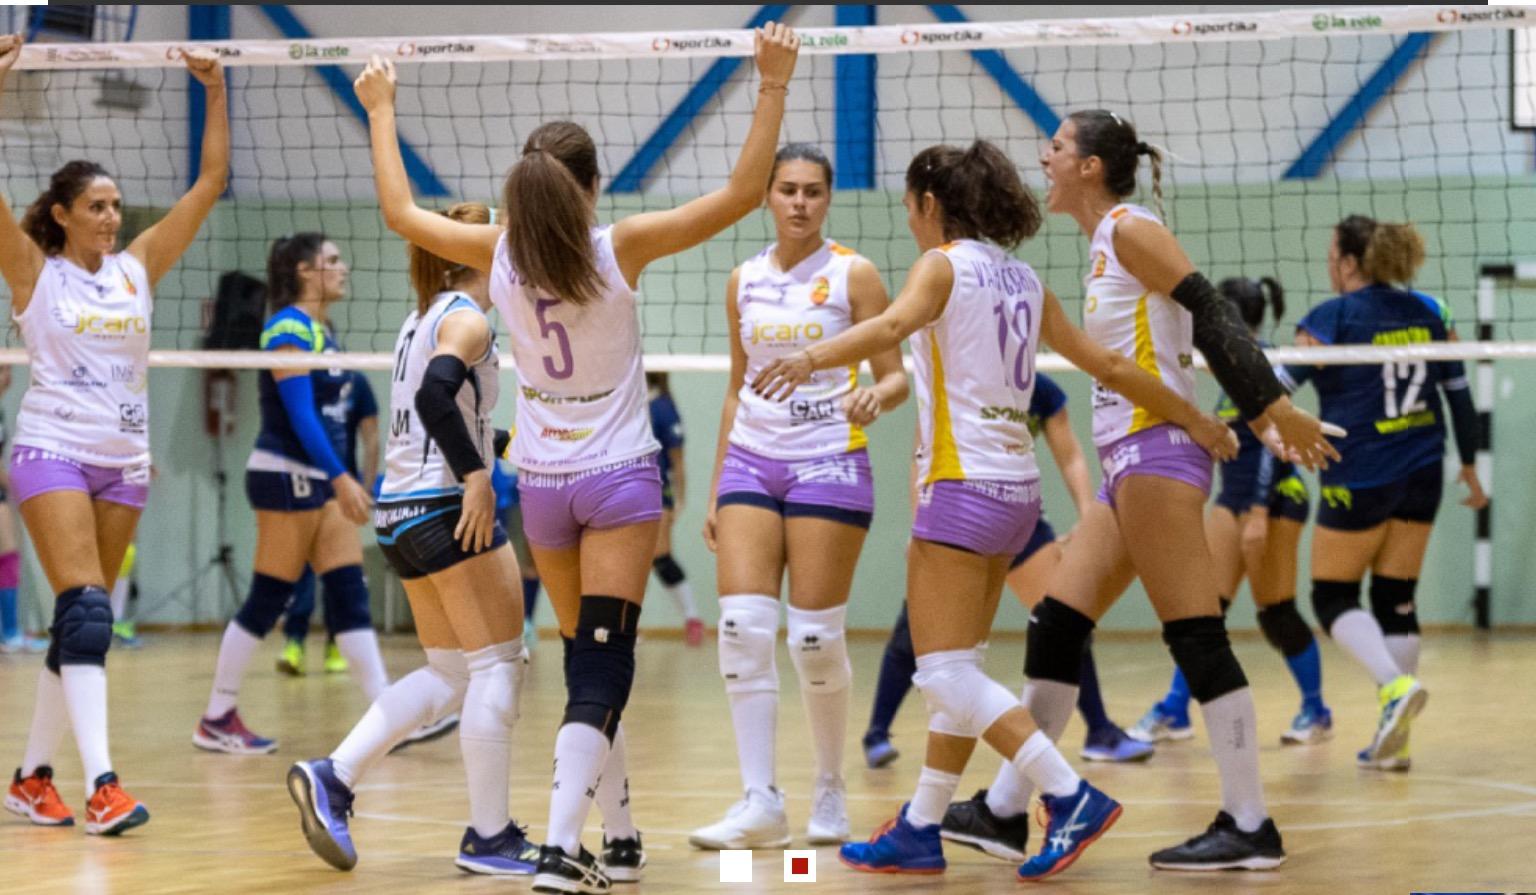 La Icaro Accademia vince il derby contro la Sg Volley